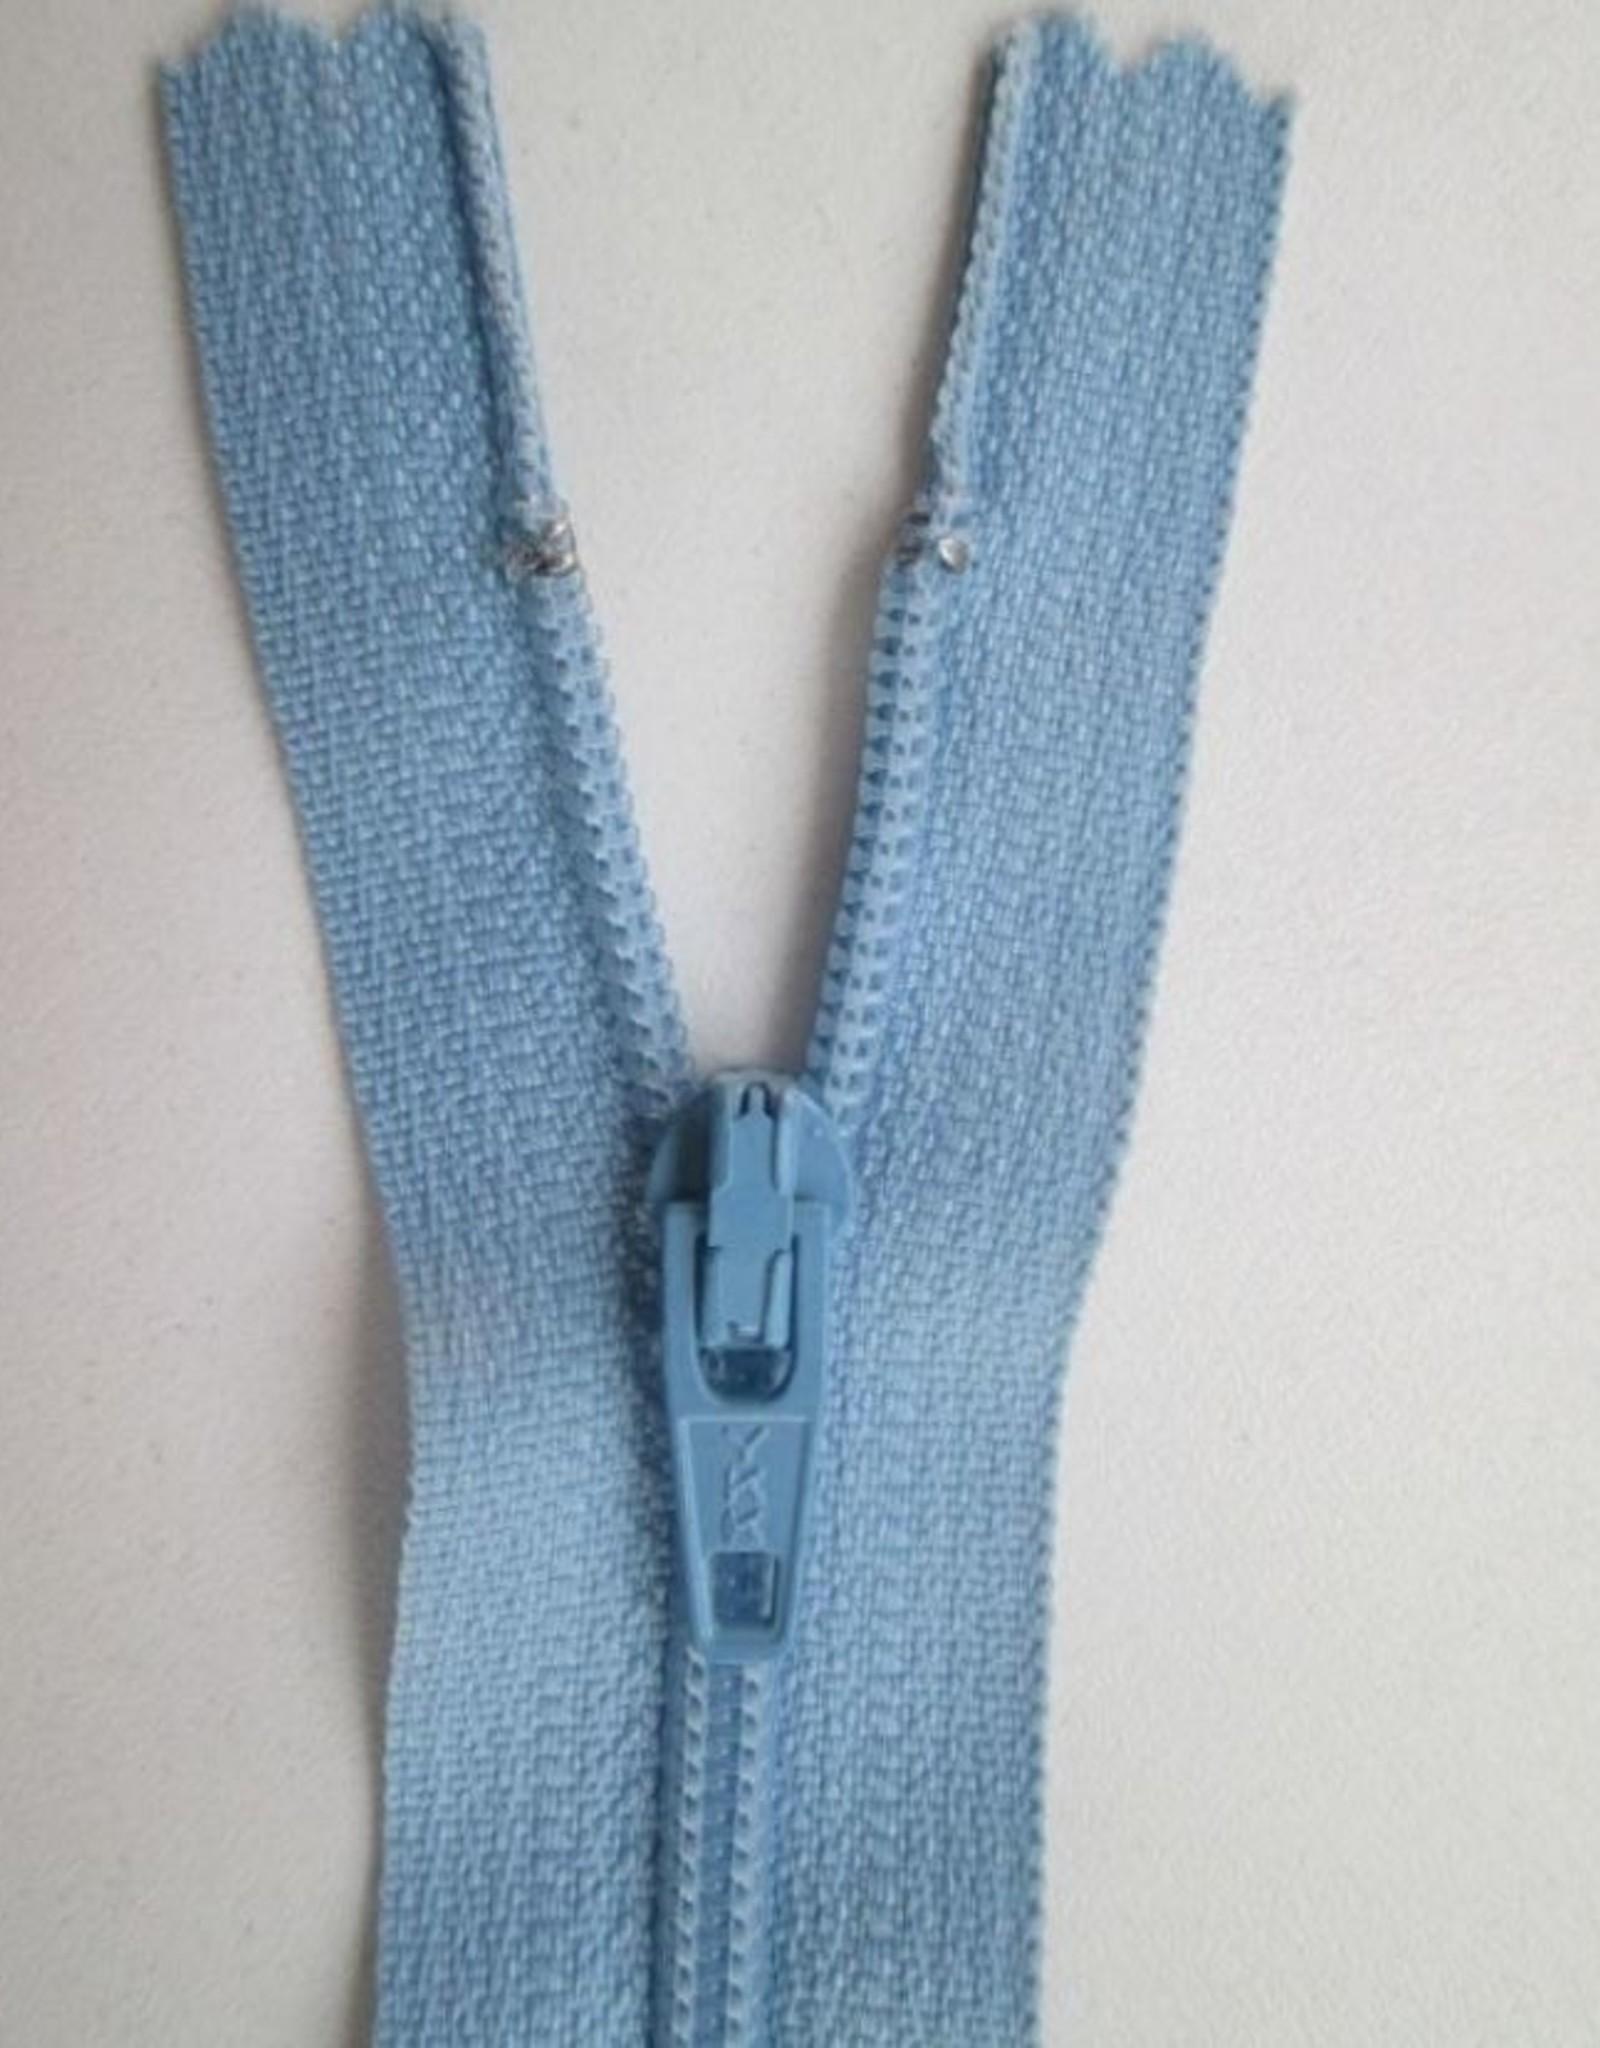 YKK Spiraalrits niet-DB 3mm midden blauw 546-35cm